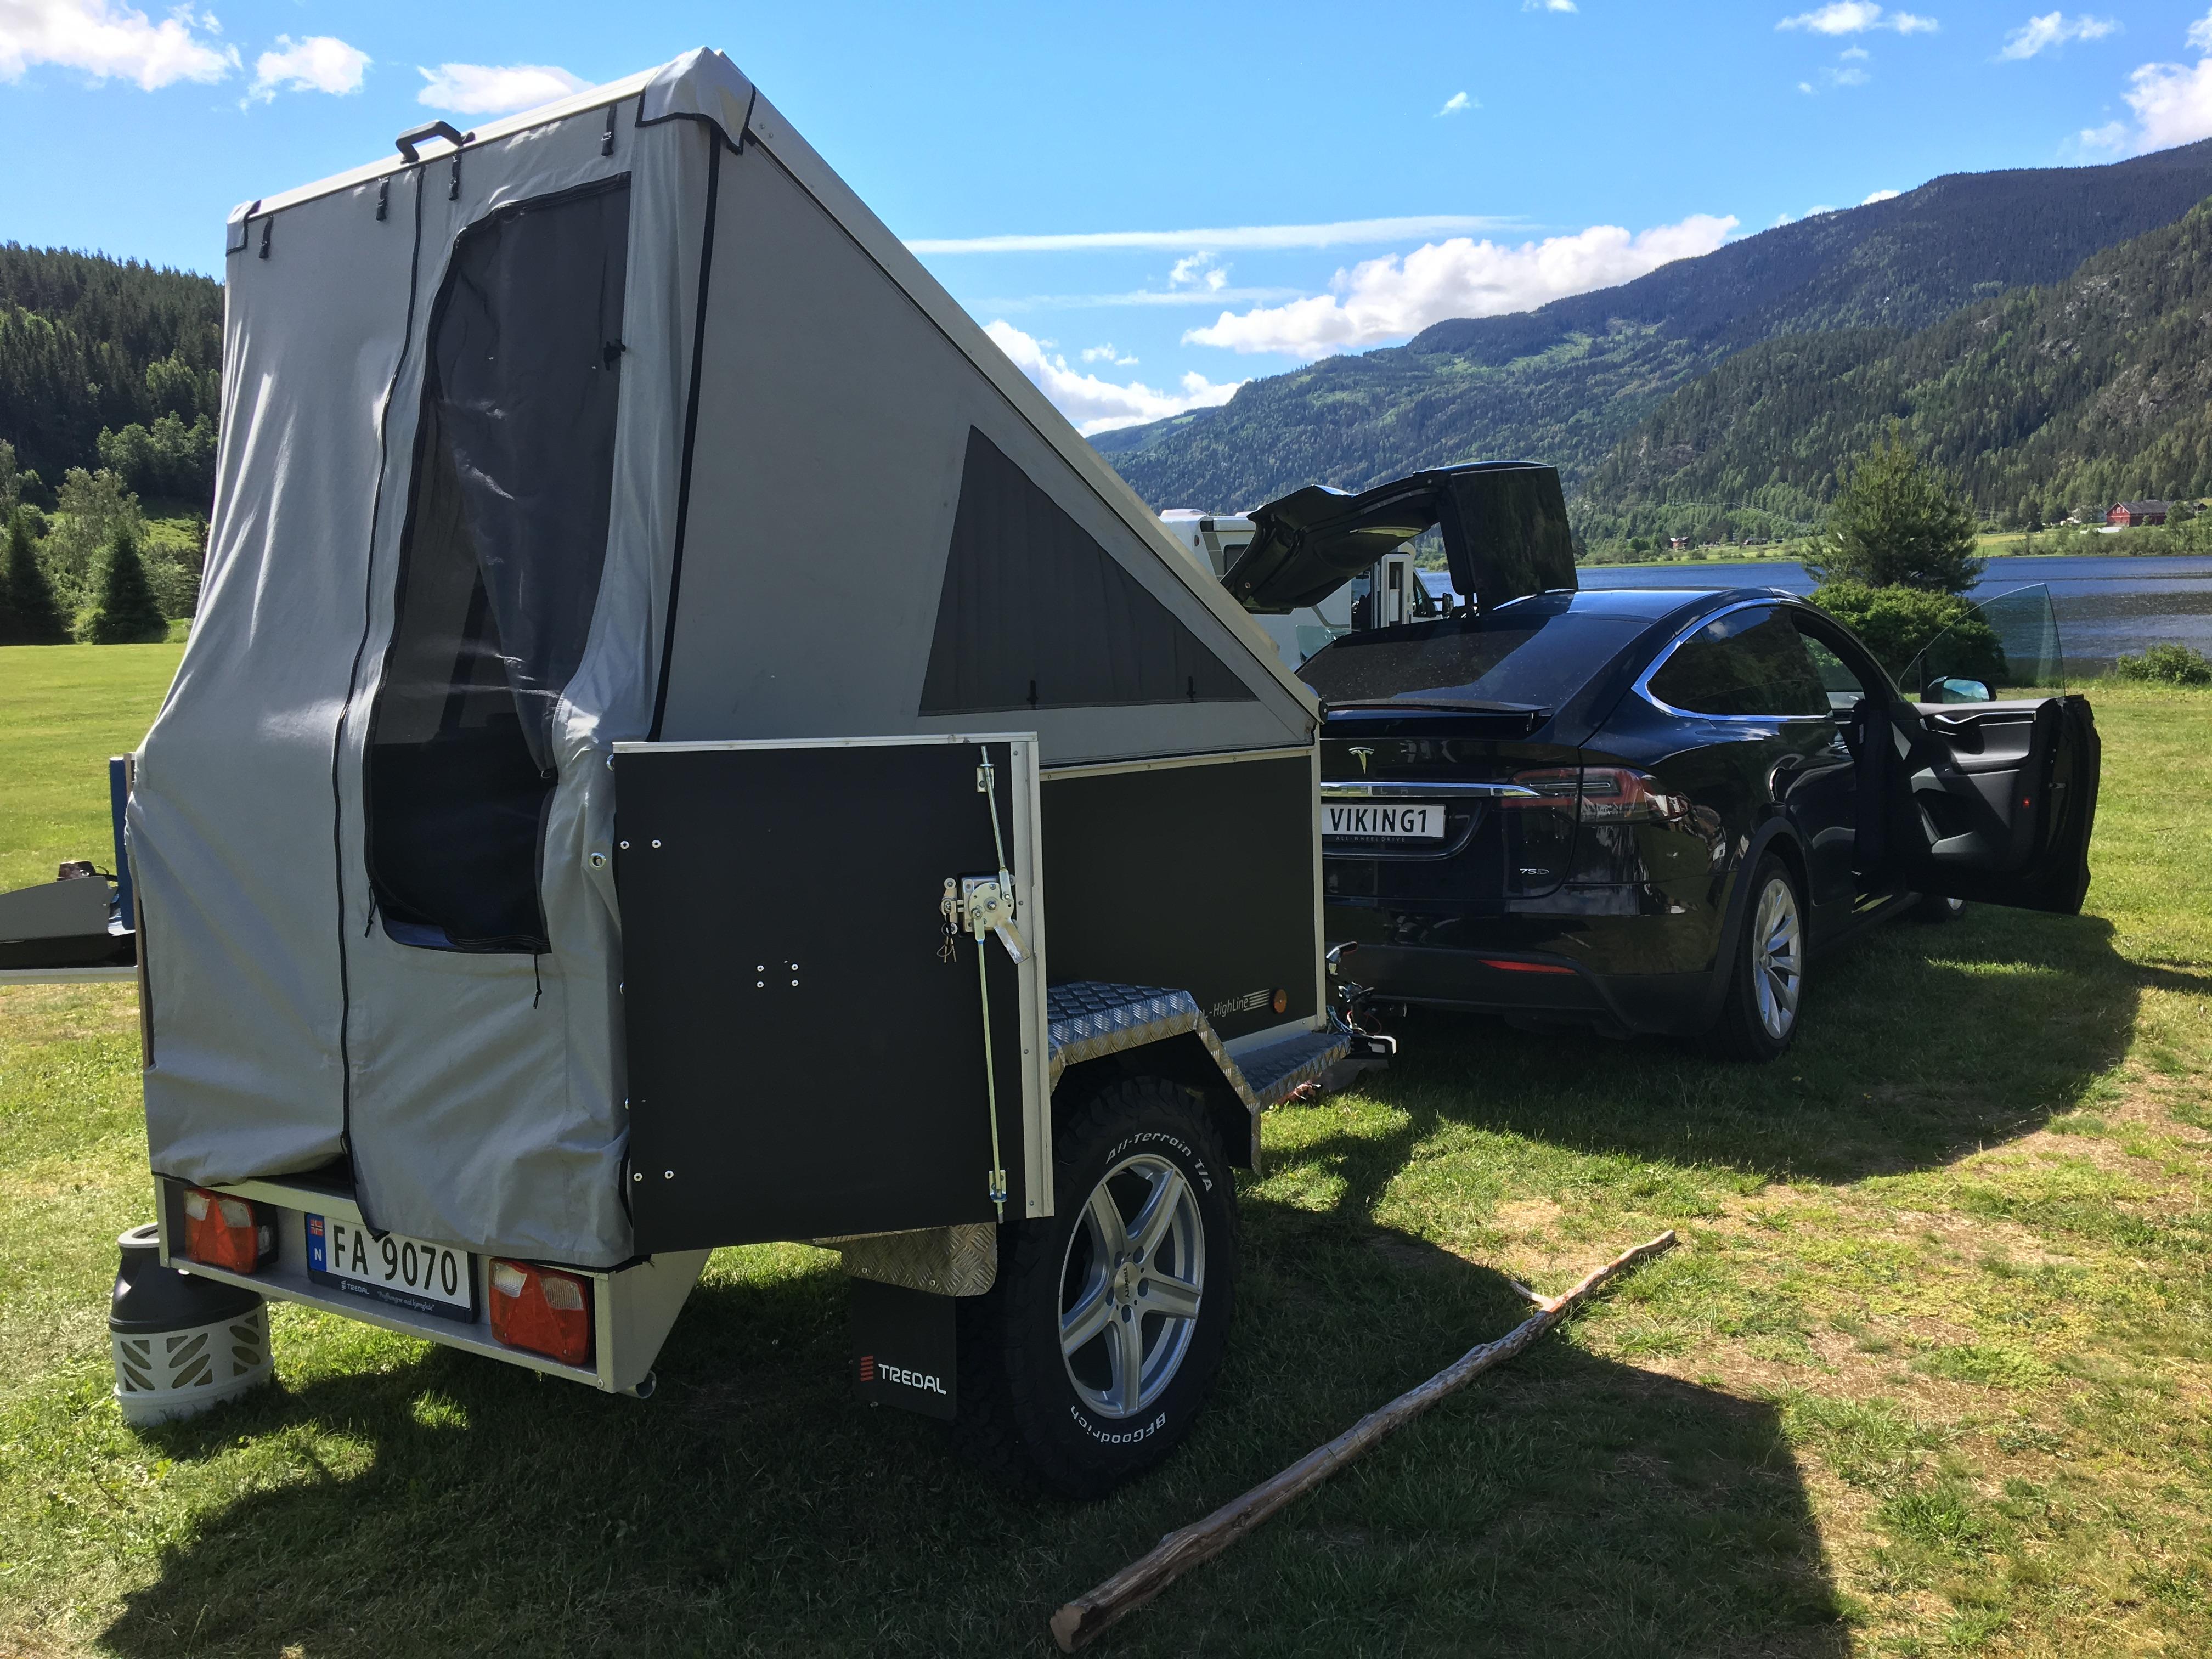 Camping Offroad T-13-UC OR Camp Svart m/rails og telt